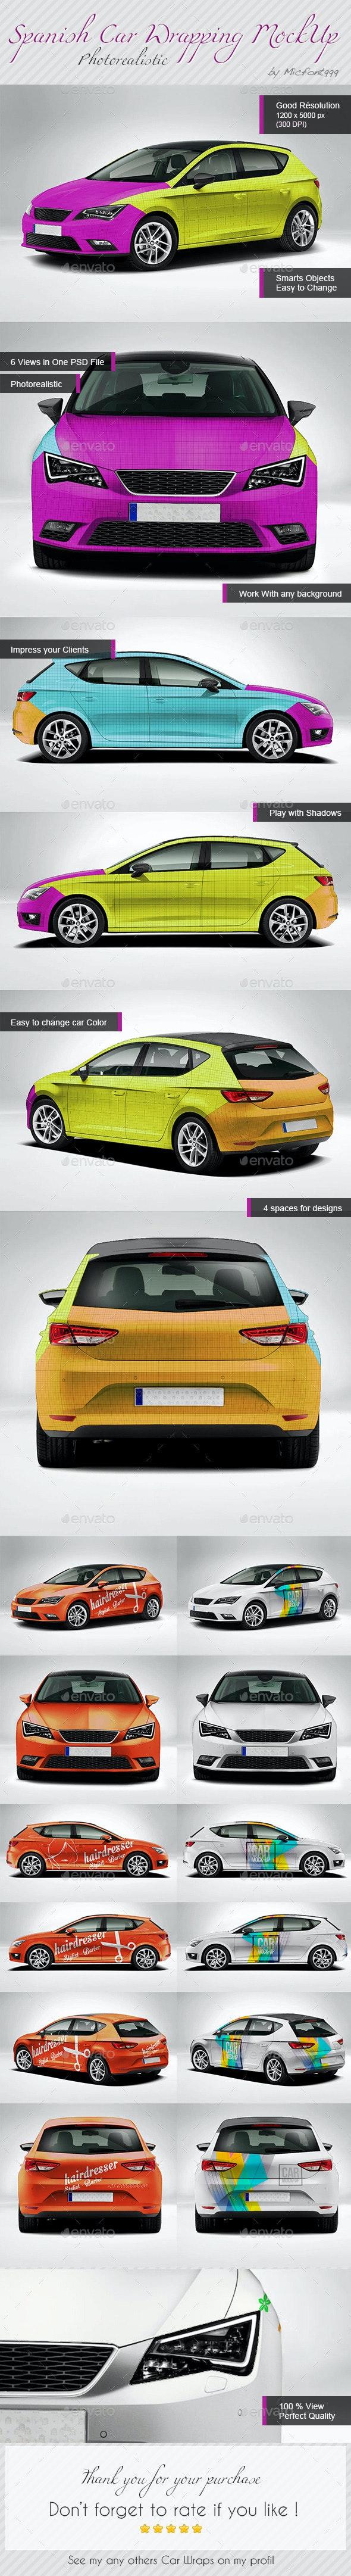 Photorealistic Spanish Leon Car Mock-up - Vehicle Wraps Print